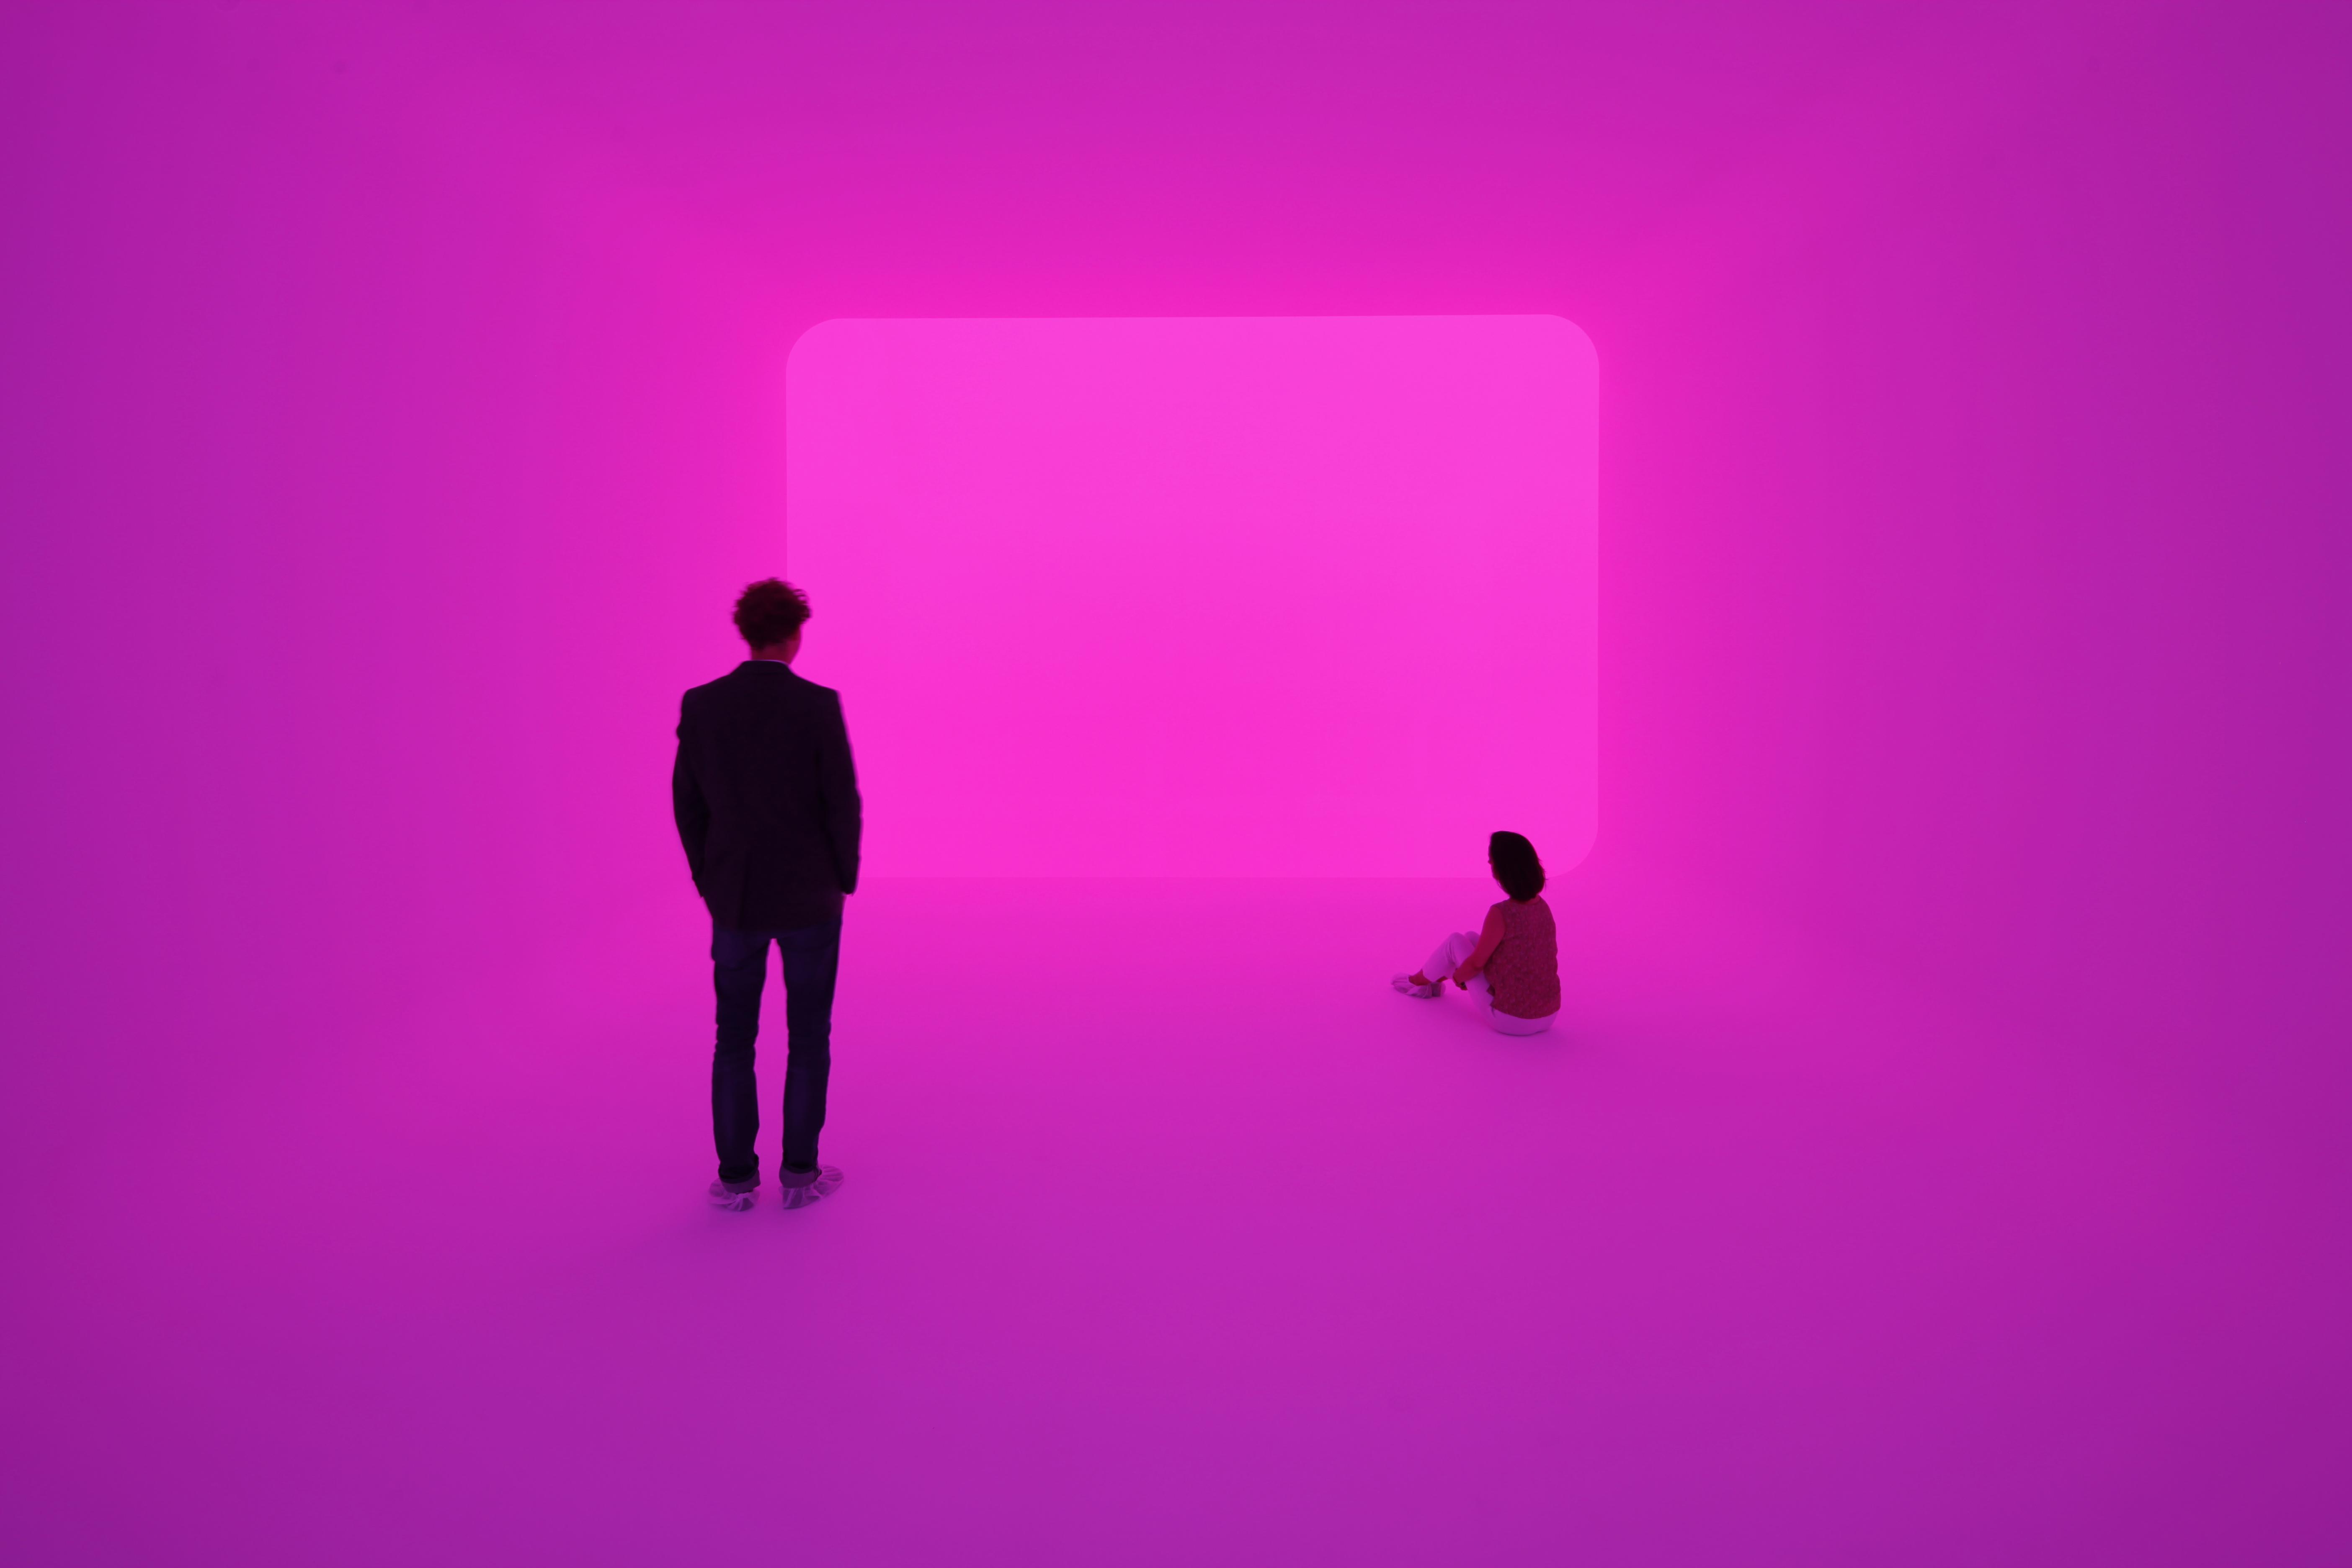 James Turrell, Ganzfeld APANI (Venice Biennial 2011), 2011, Installation, LED, 16 x 12 x 6m, Foto: Florian Holzherr ; Courtesy Häusler Contemporary München | Zürich